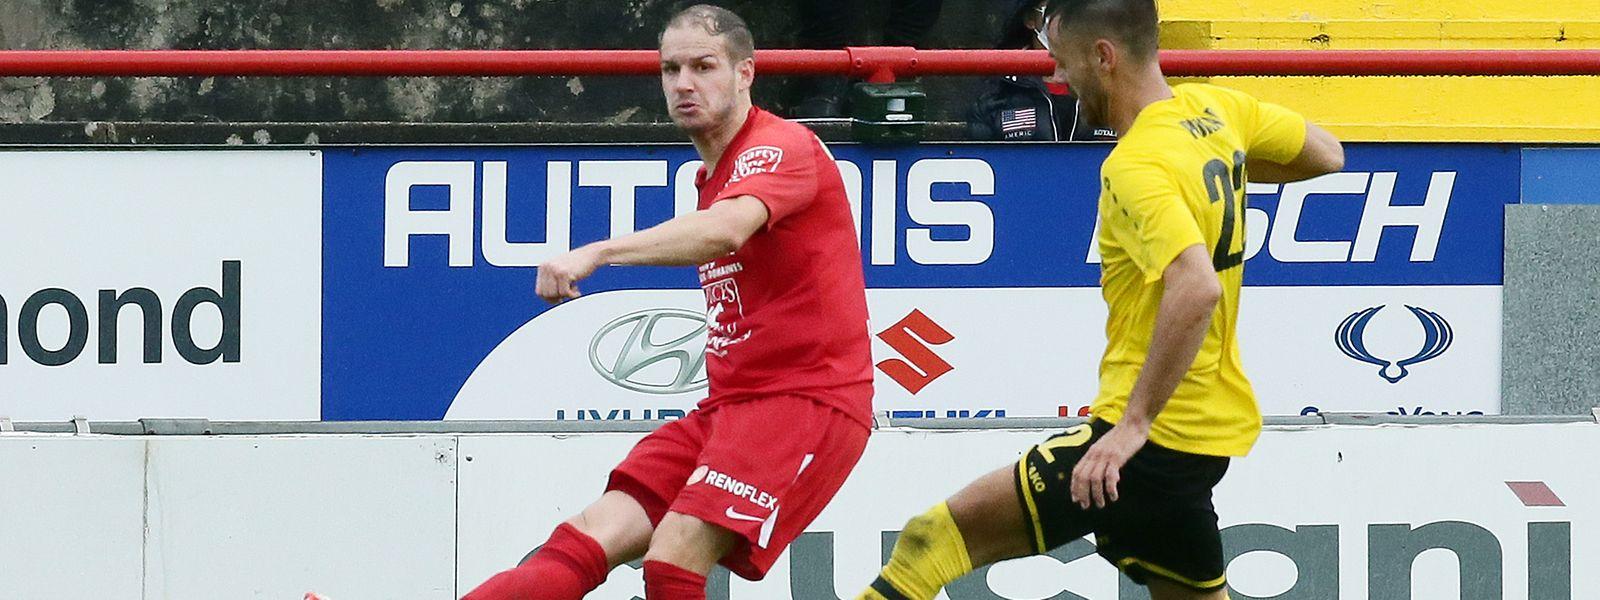 Rosports Daniel Bartsch (l.) spielt den Ball ab, ehe Düdelingens Mario Pokar herbeieilt.